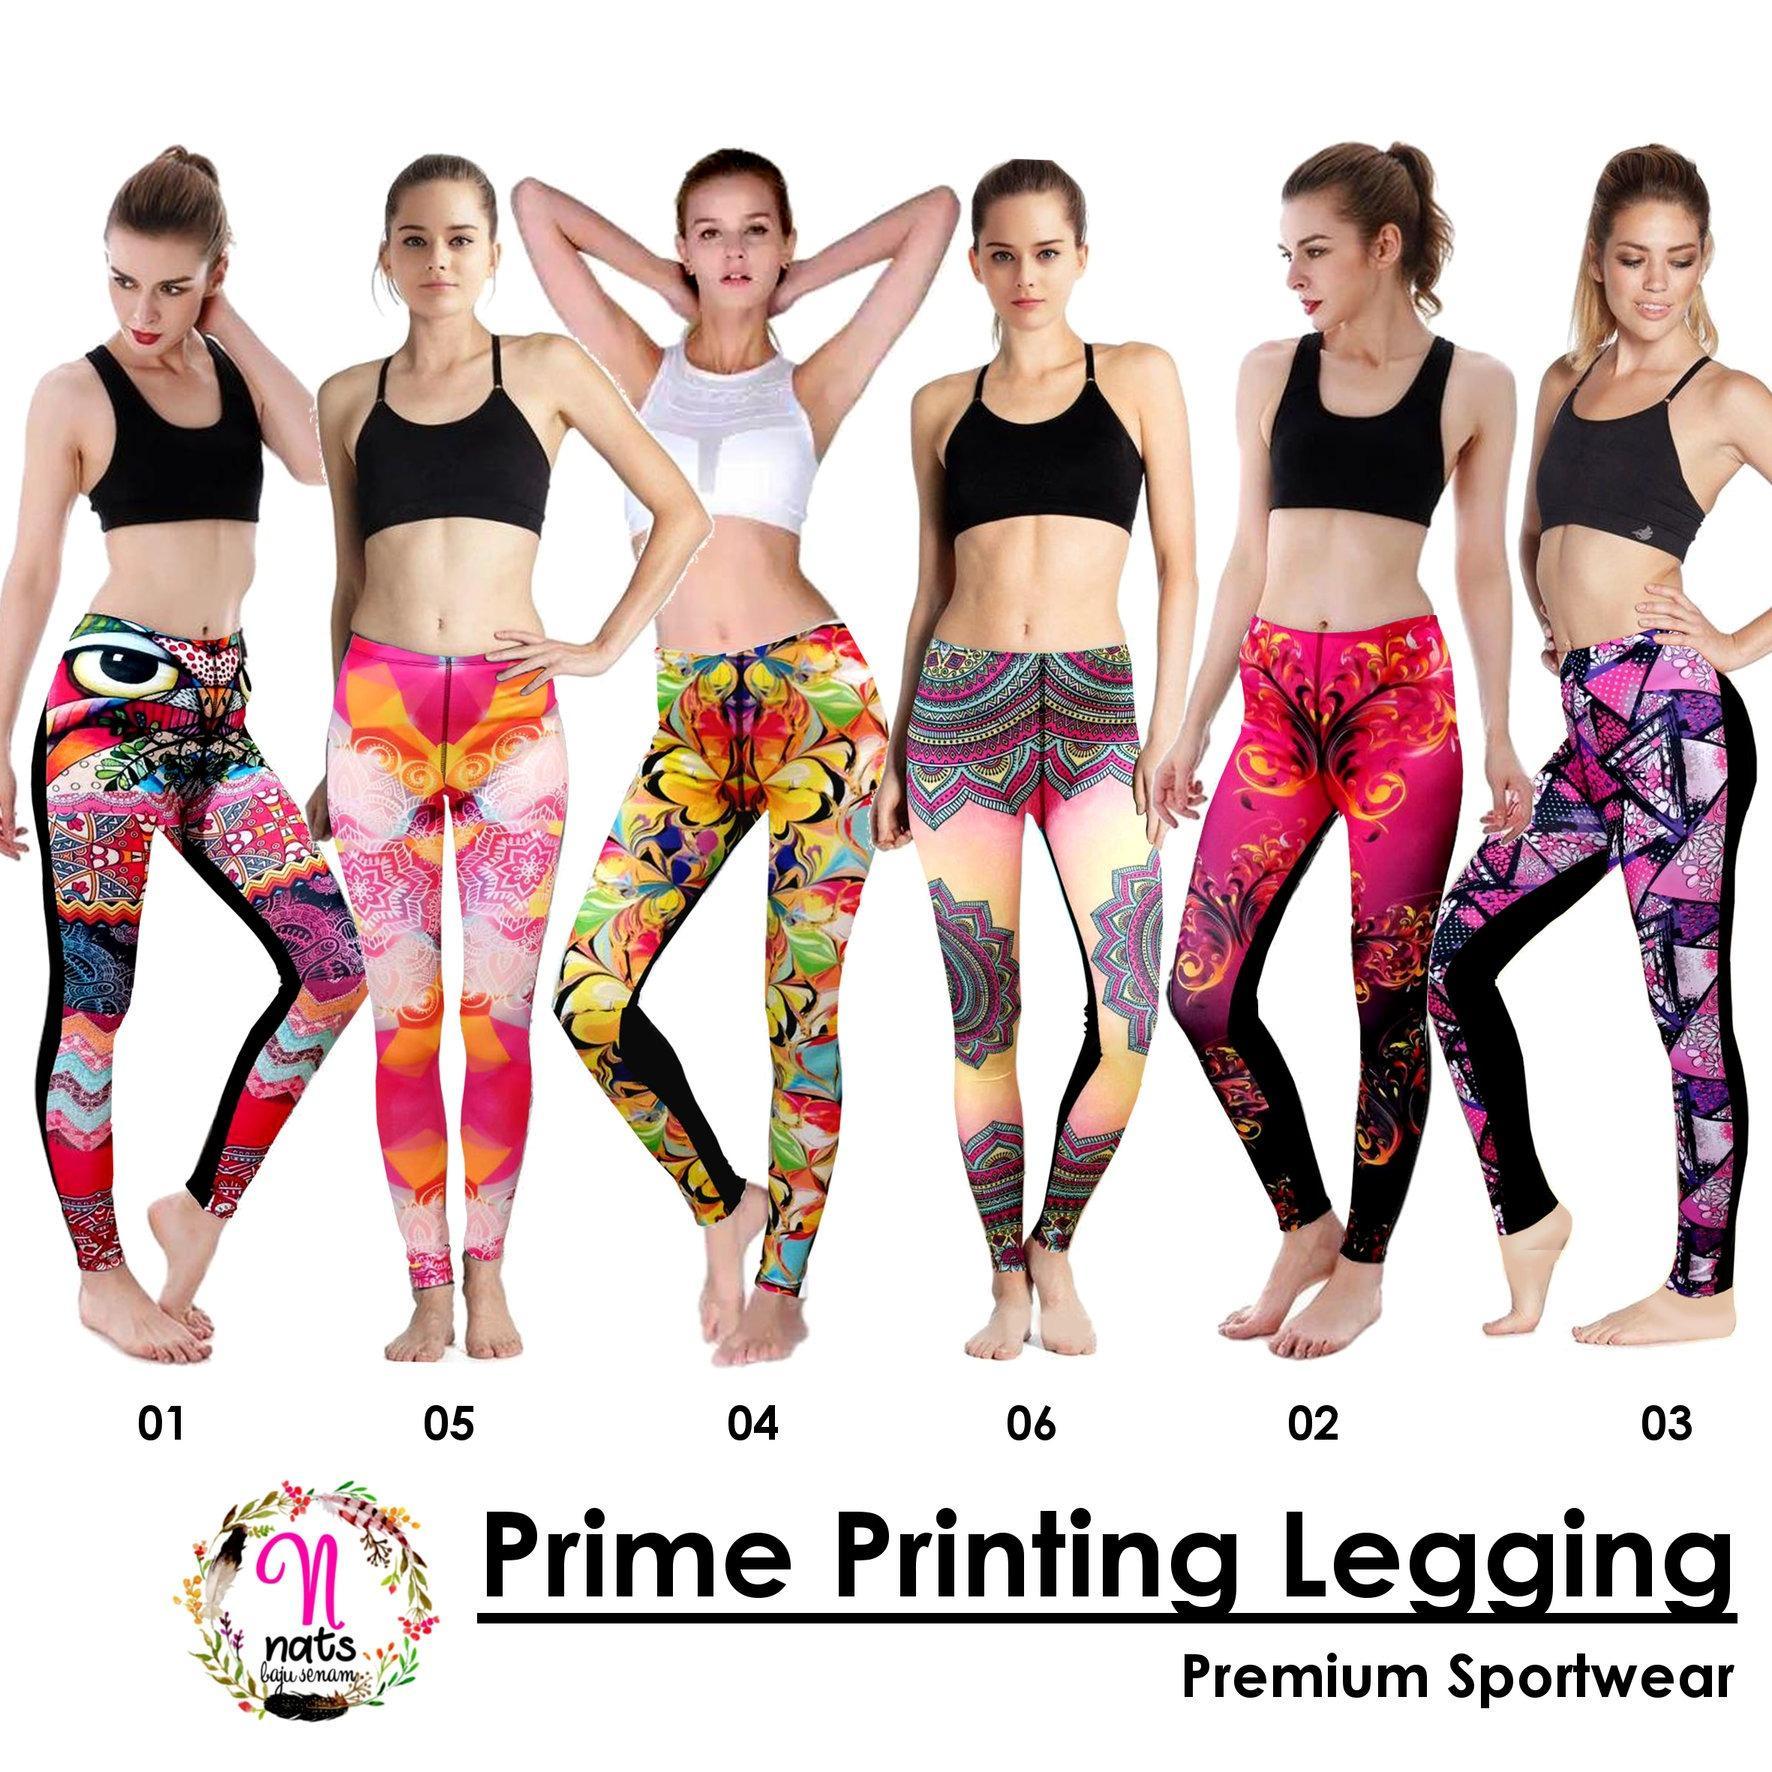 Prime Printing Legging